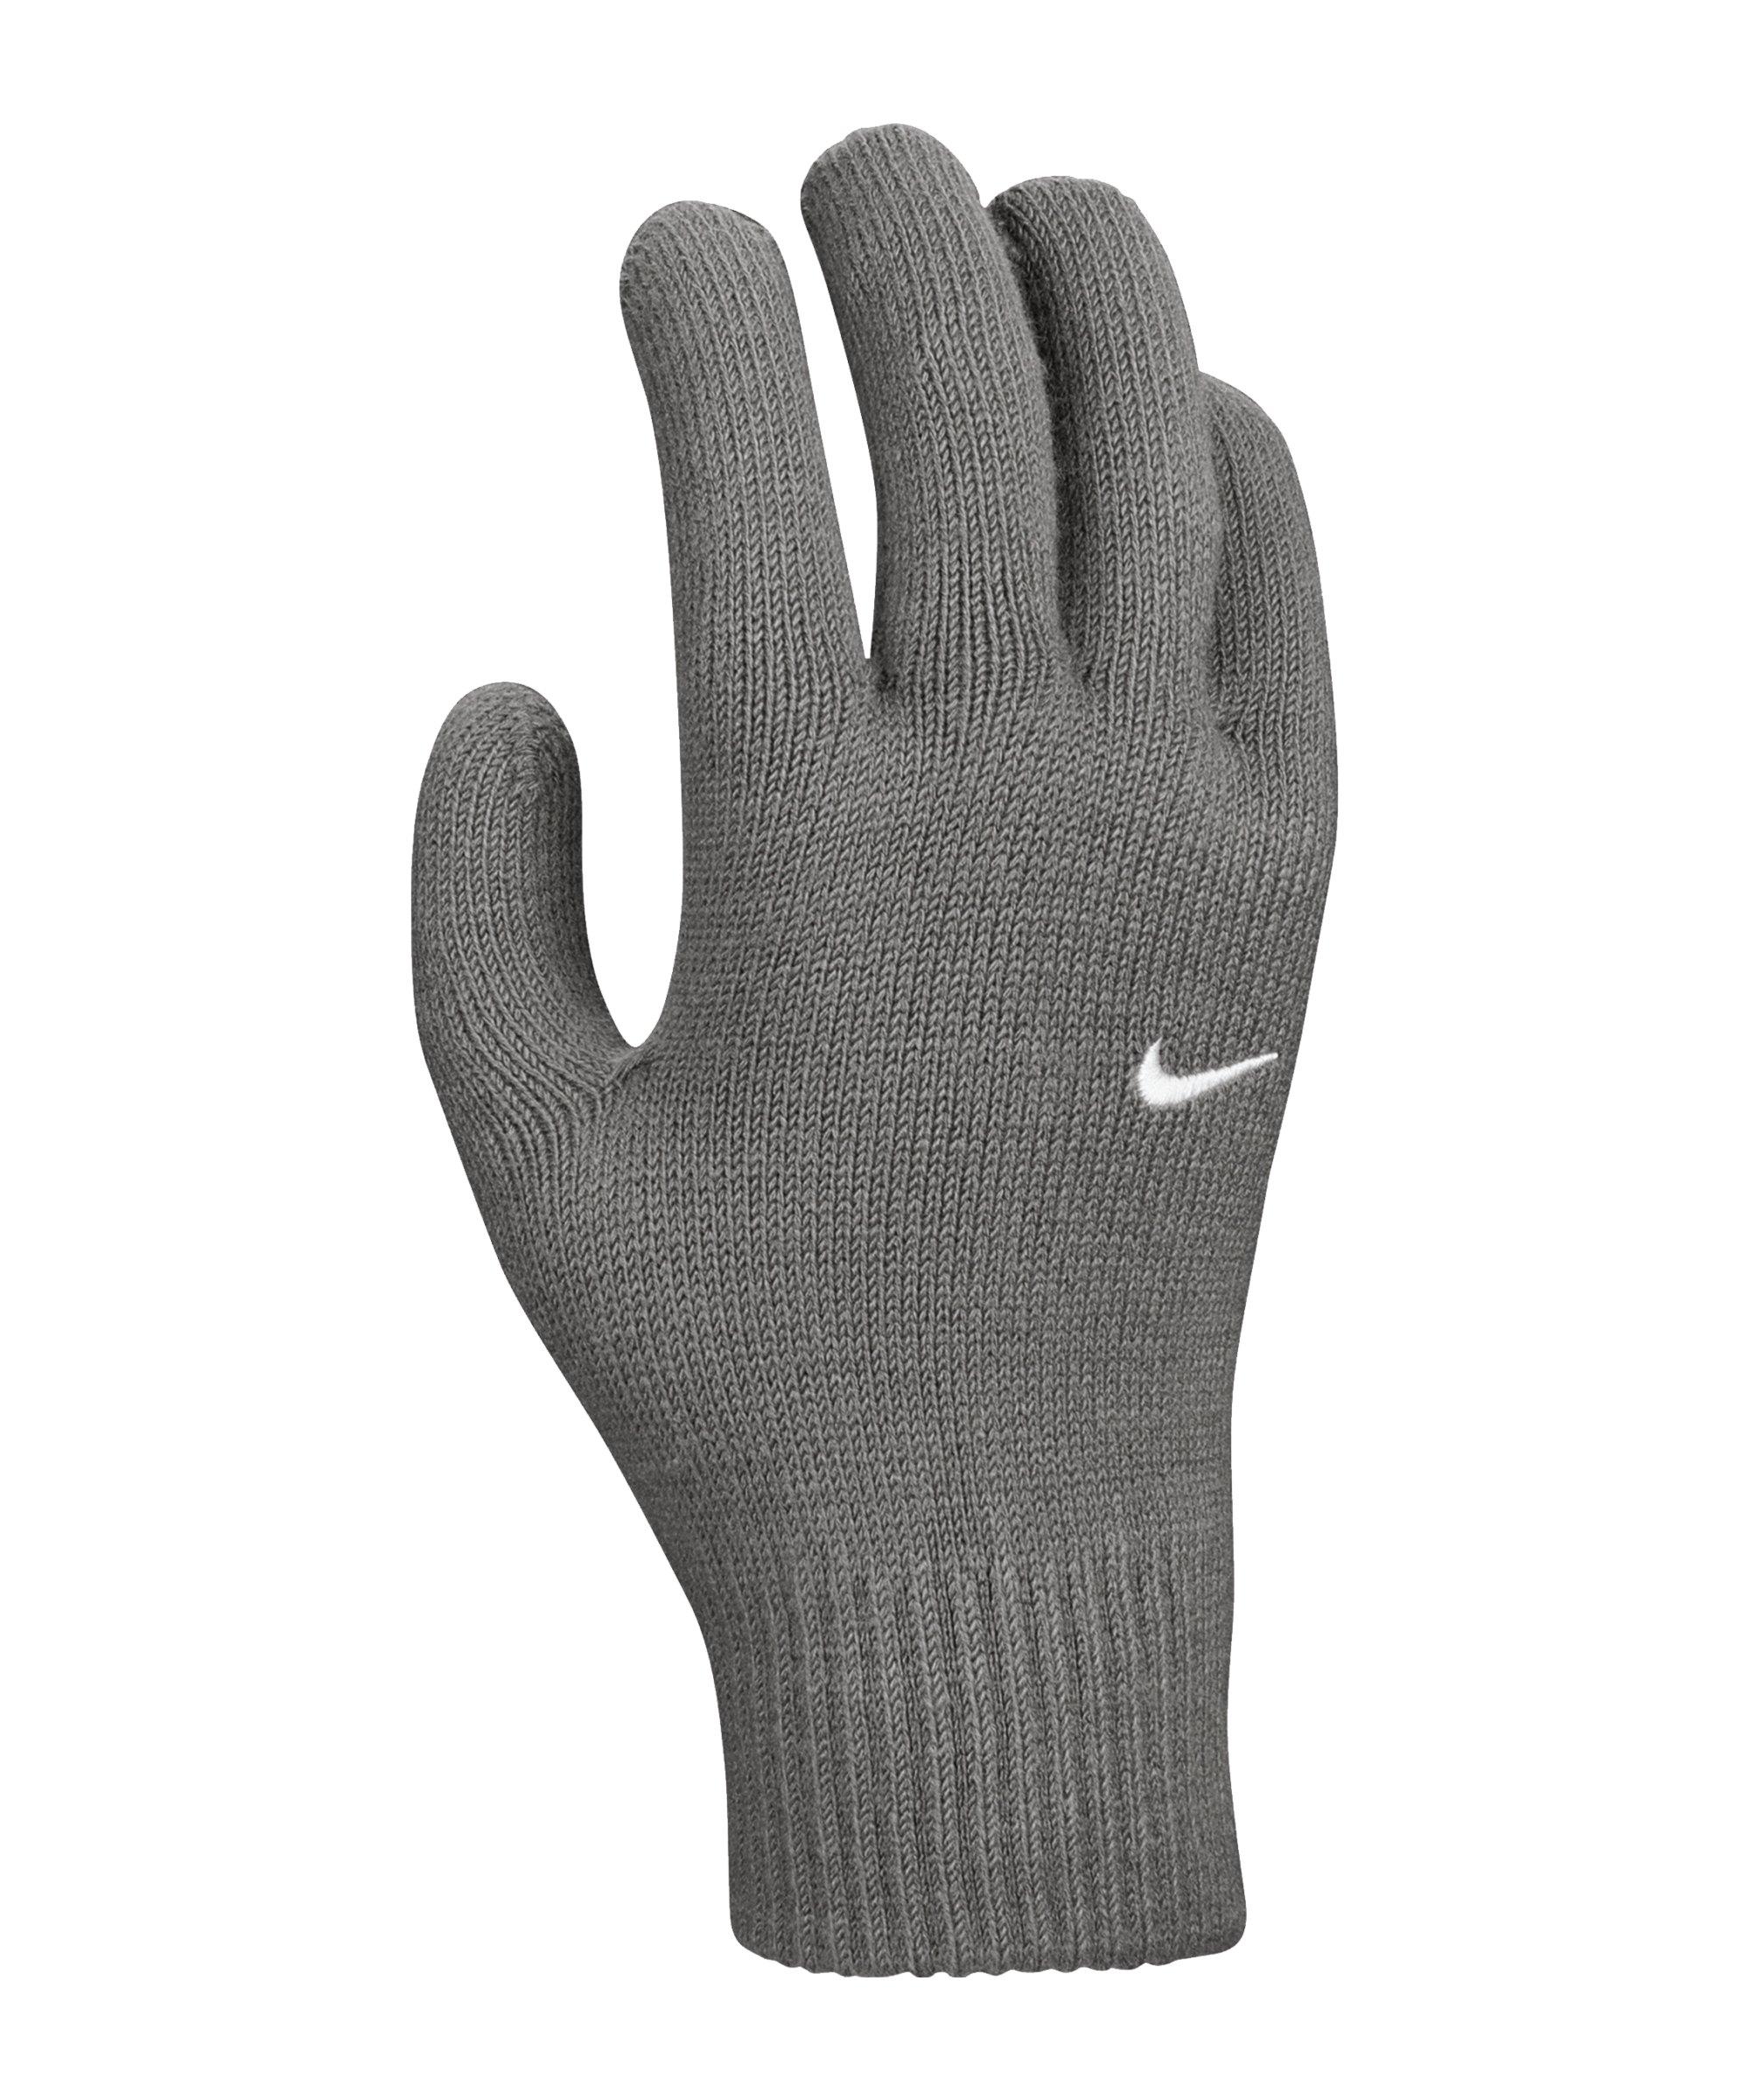 Nike Swoosh Knit Spielerhandschuhe 2.0 Grau F084 - grau